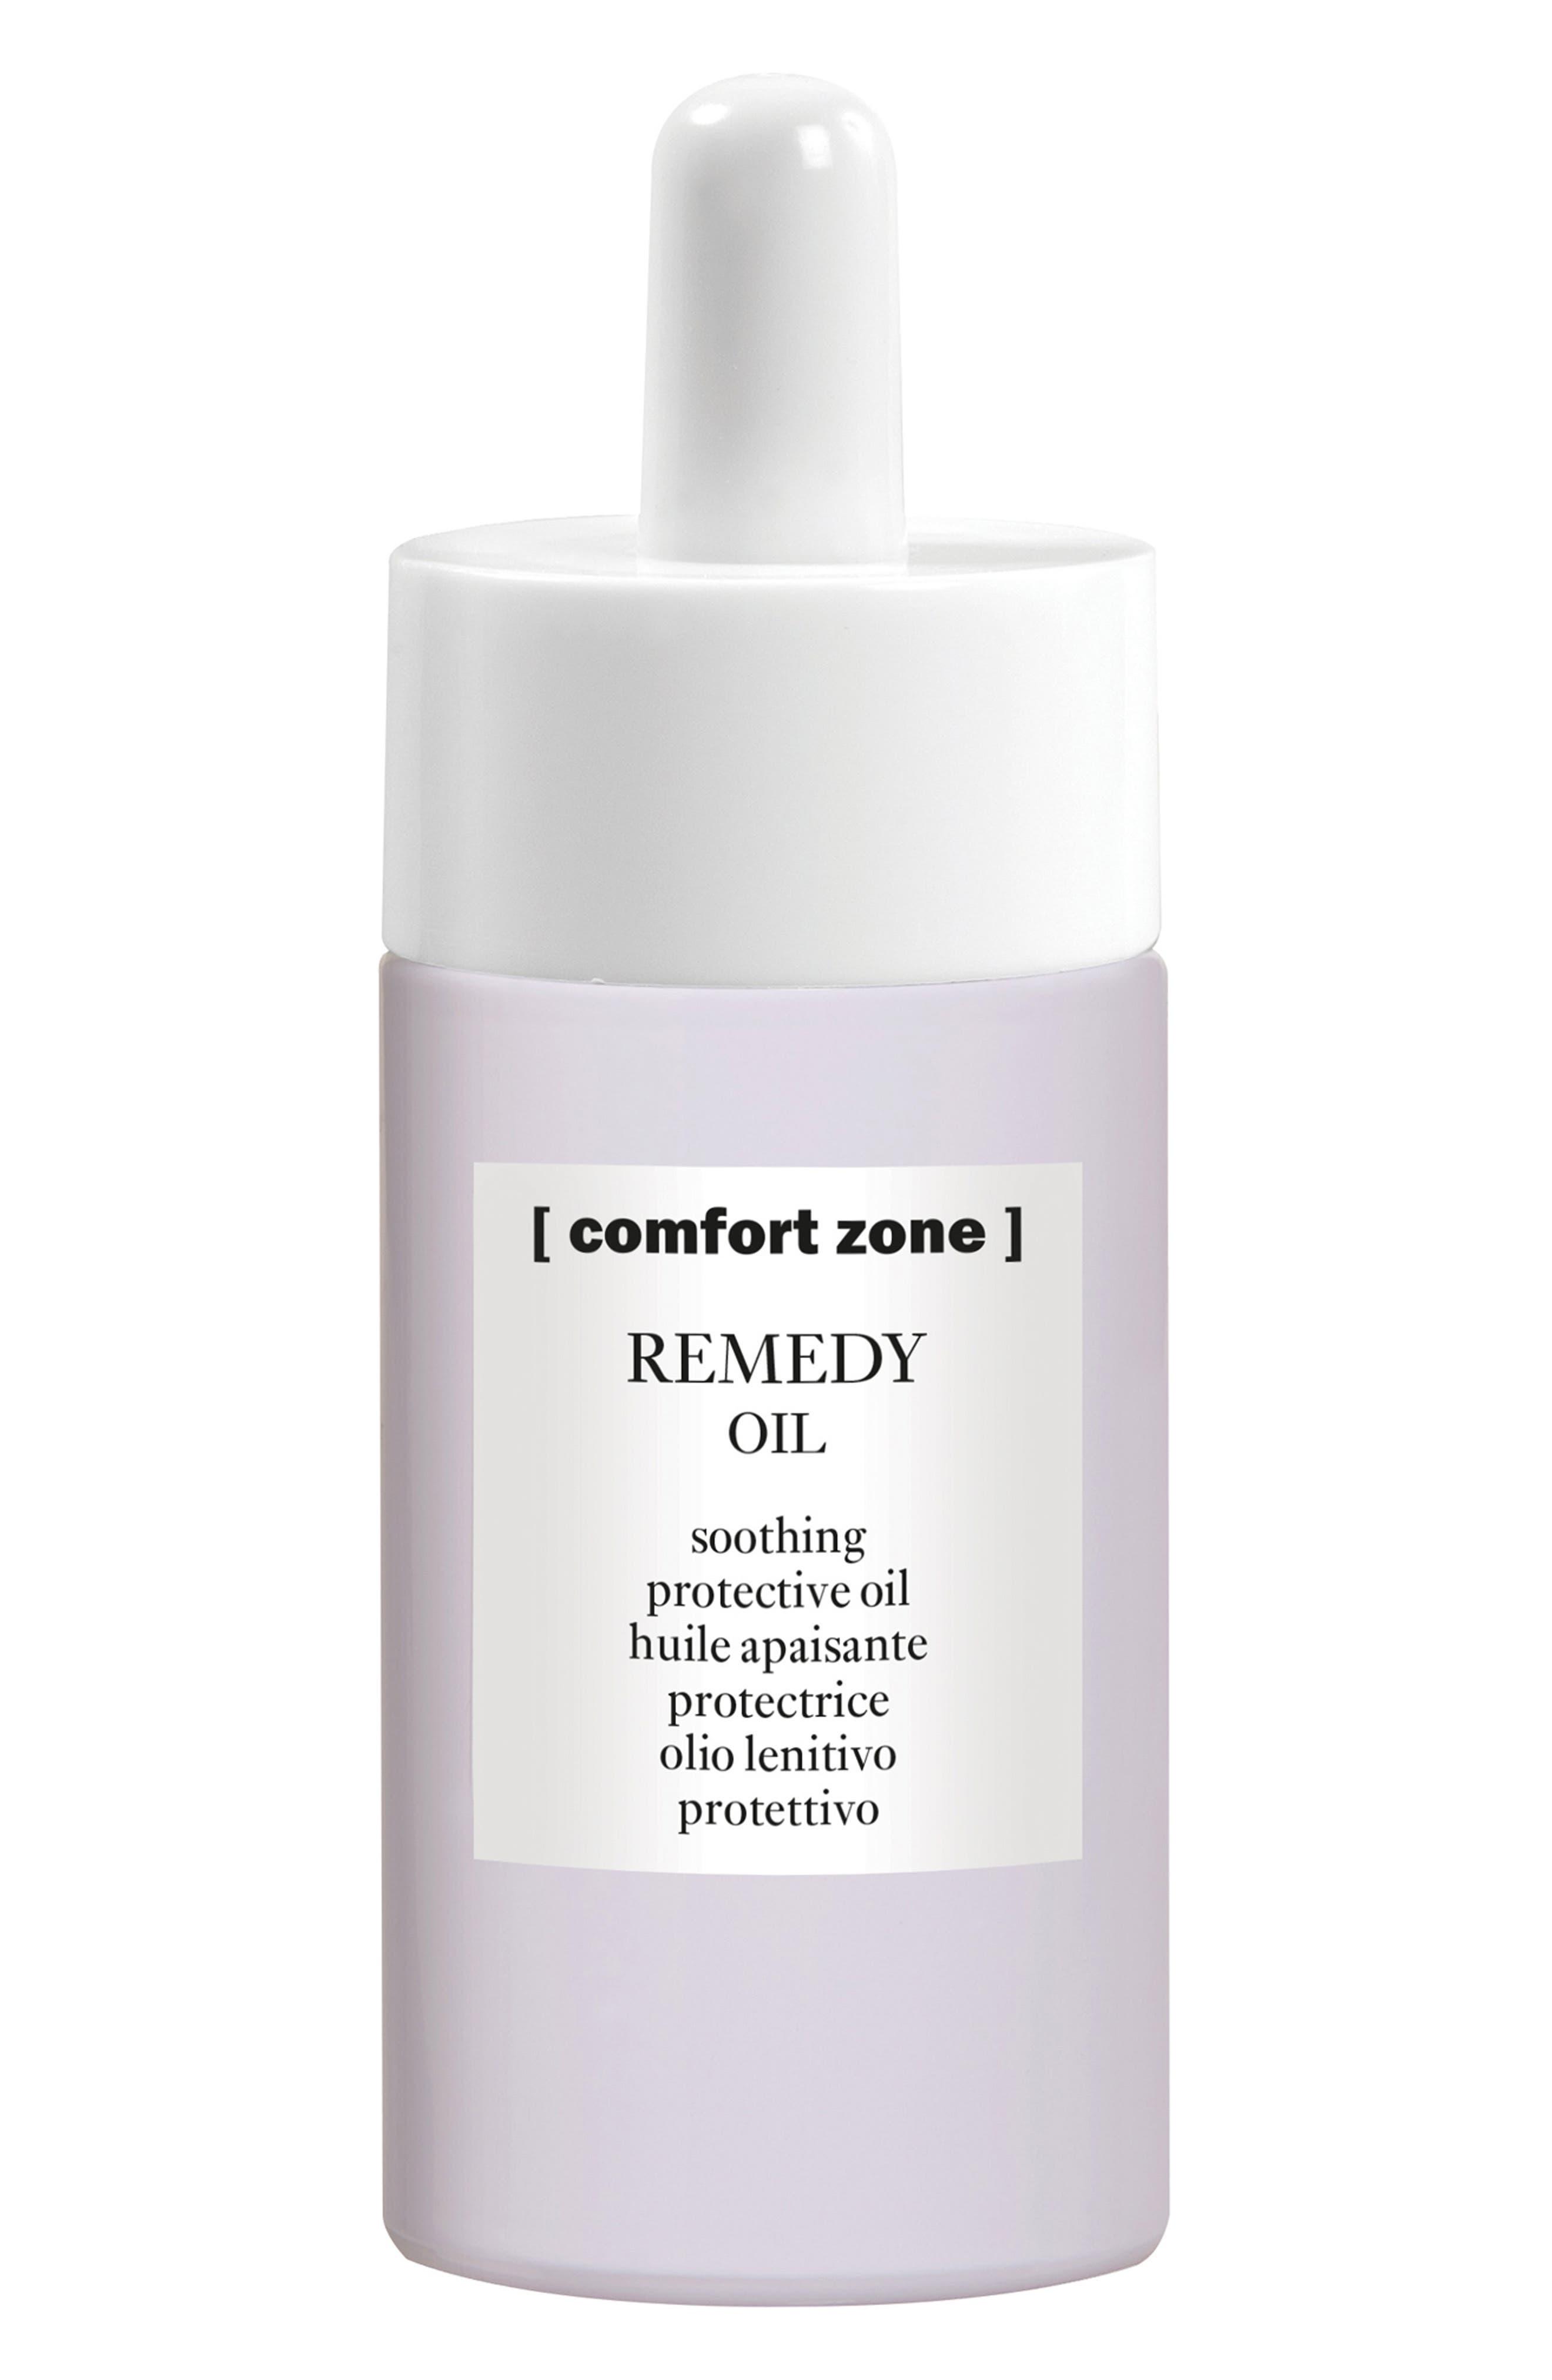 Remedy Oil